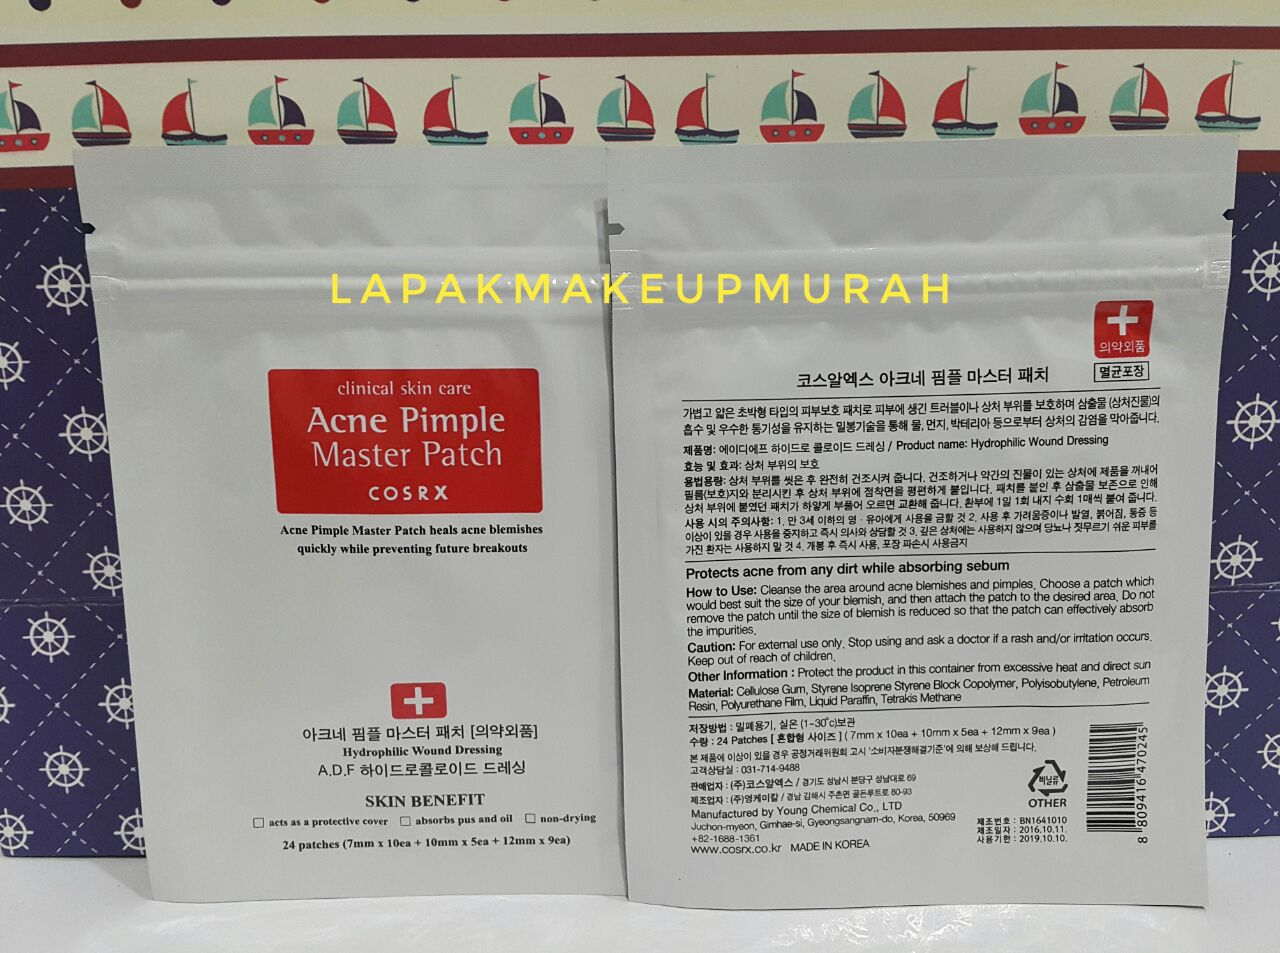 Jual Korea Cosrx Acne Pimple Master Patch Lapak Makeup Murah Isi 24ea Tokopedia